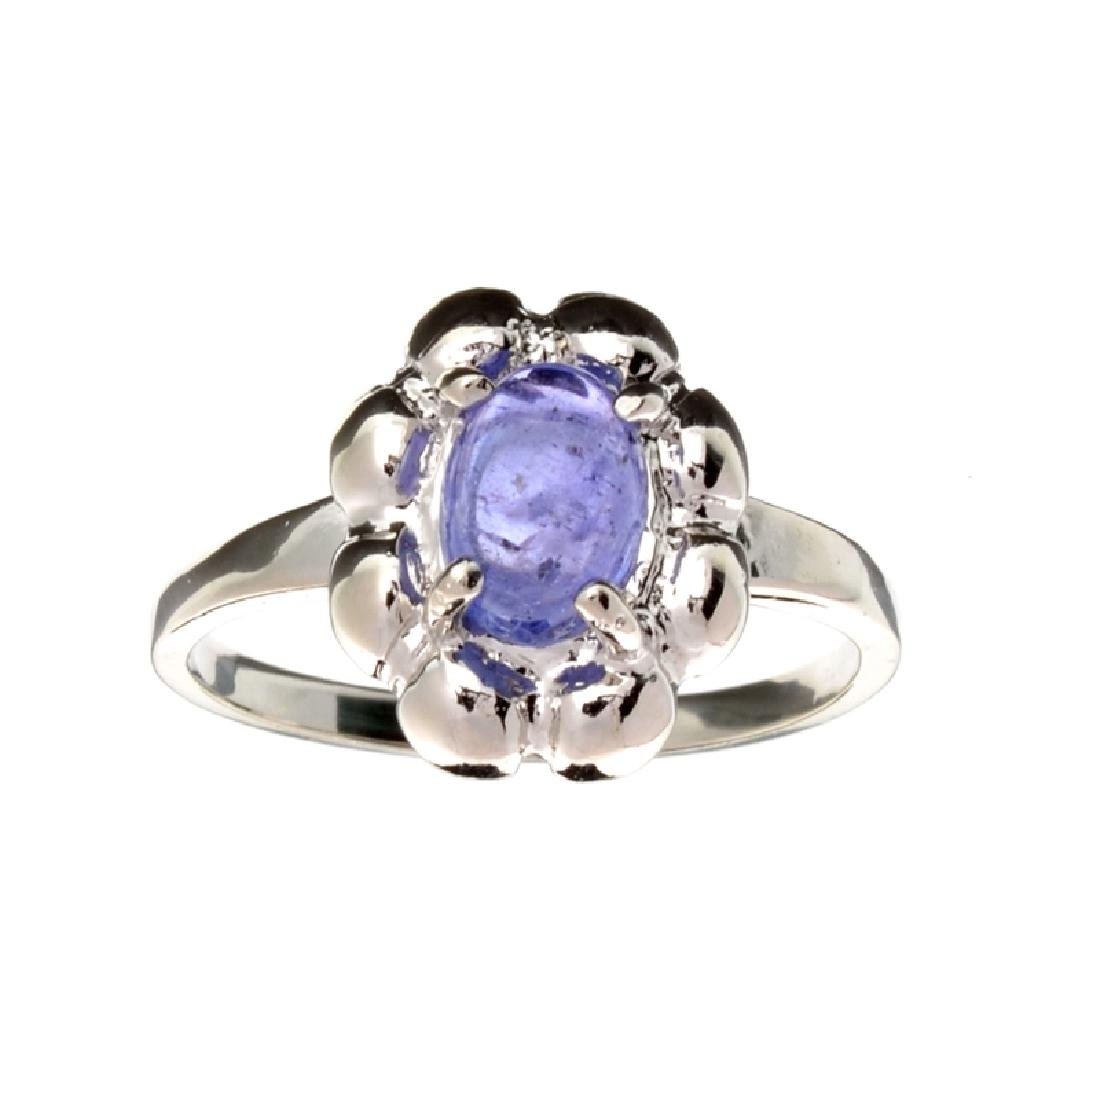 APP: 1k Fine Jewelry 2.00CT Oval Cut Cabochon Tanzanite